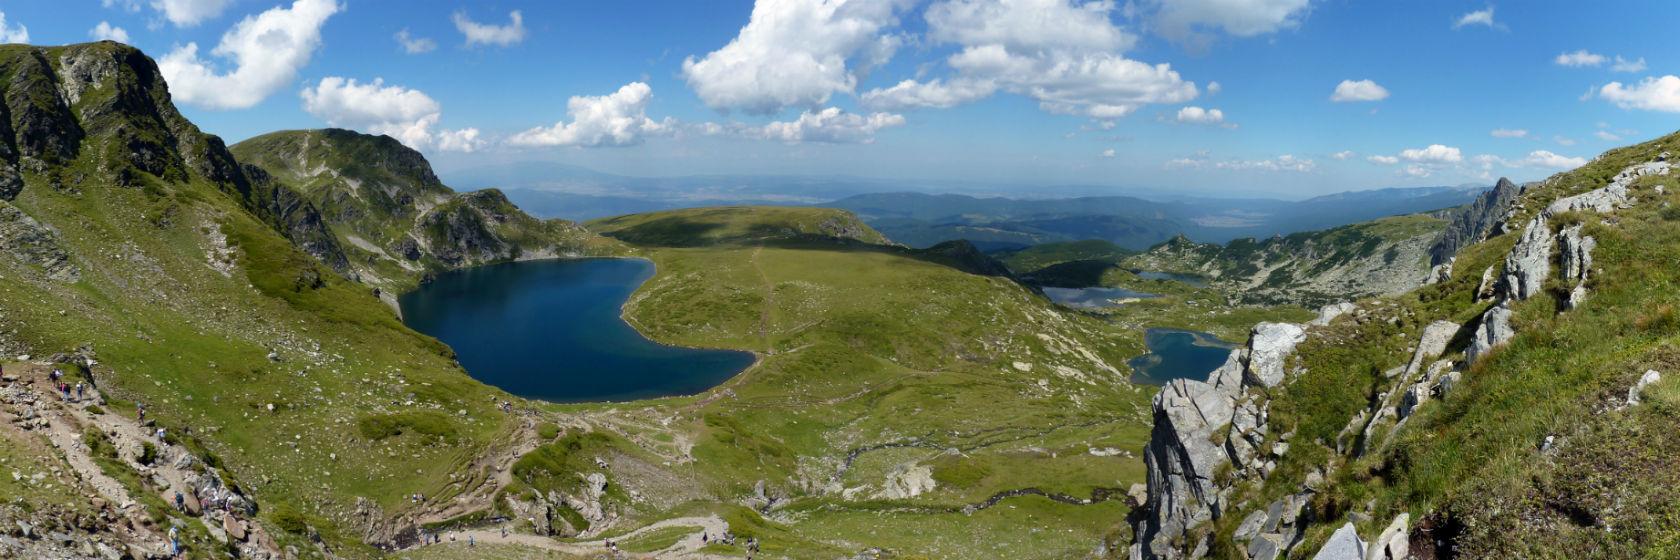 The Seven Rila Lakes & Rila Monastery (bestseller)